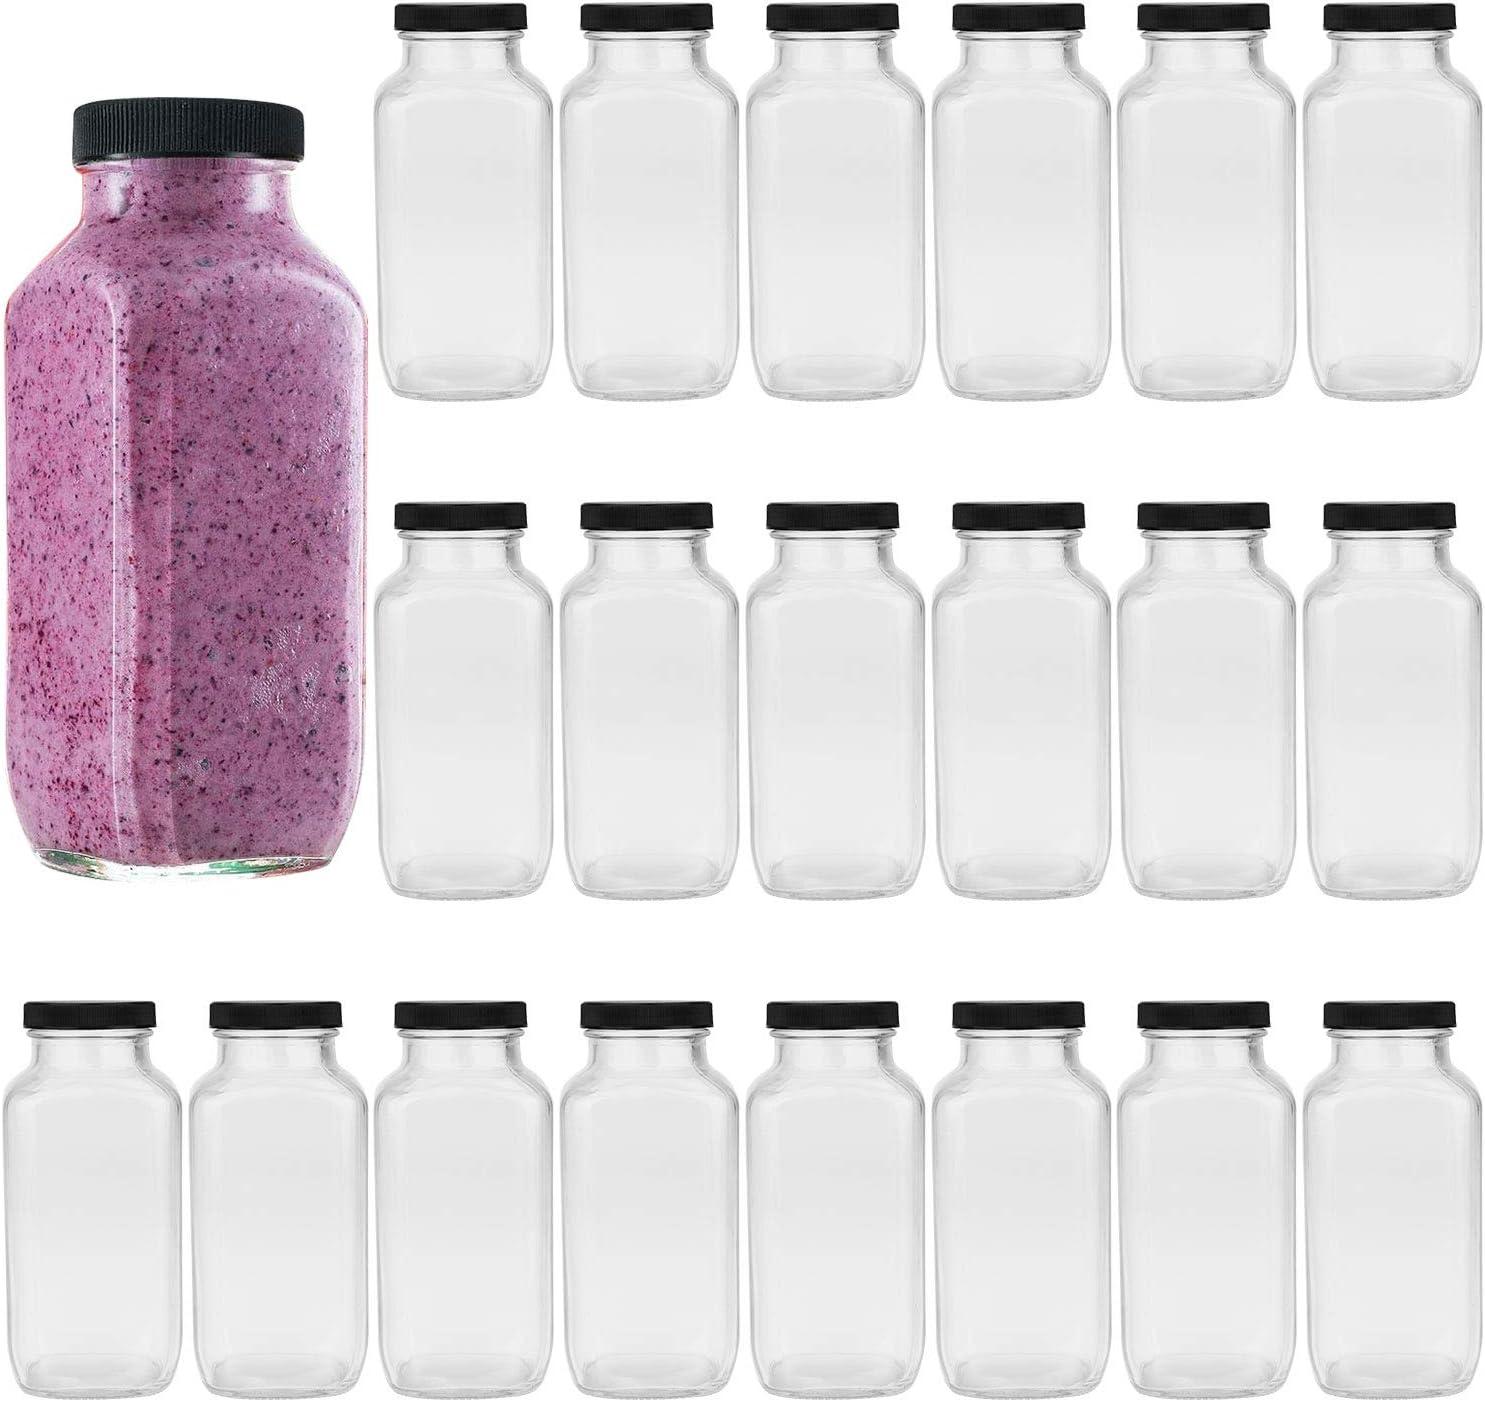 Encheng Beverages Bottles 12oz,Glass Water Botttles with Lids,Octagonal Vintage Drinking Bottles 350ml,Juice Bottles for Storage Tea,Kombucha,Milk Bottles Smoothies Bottles 20Pack …